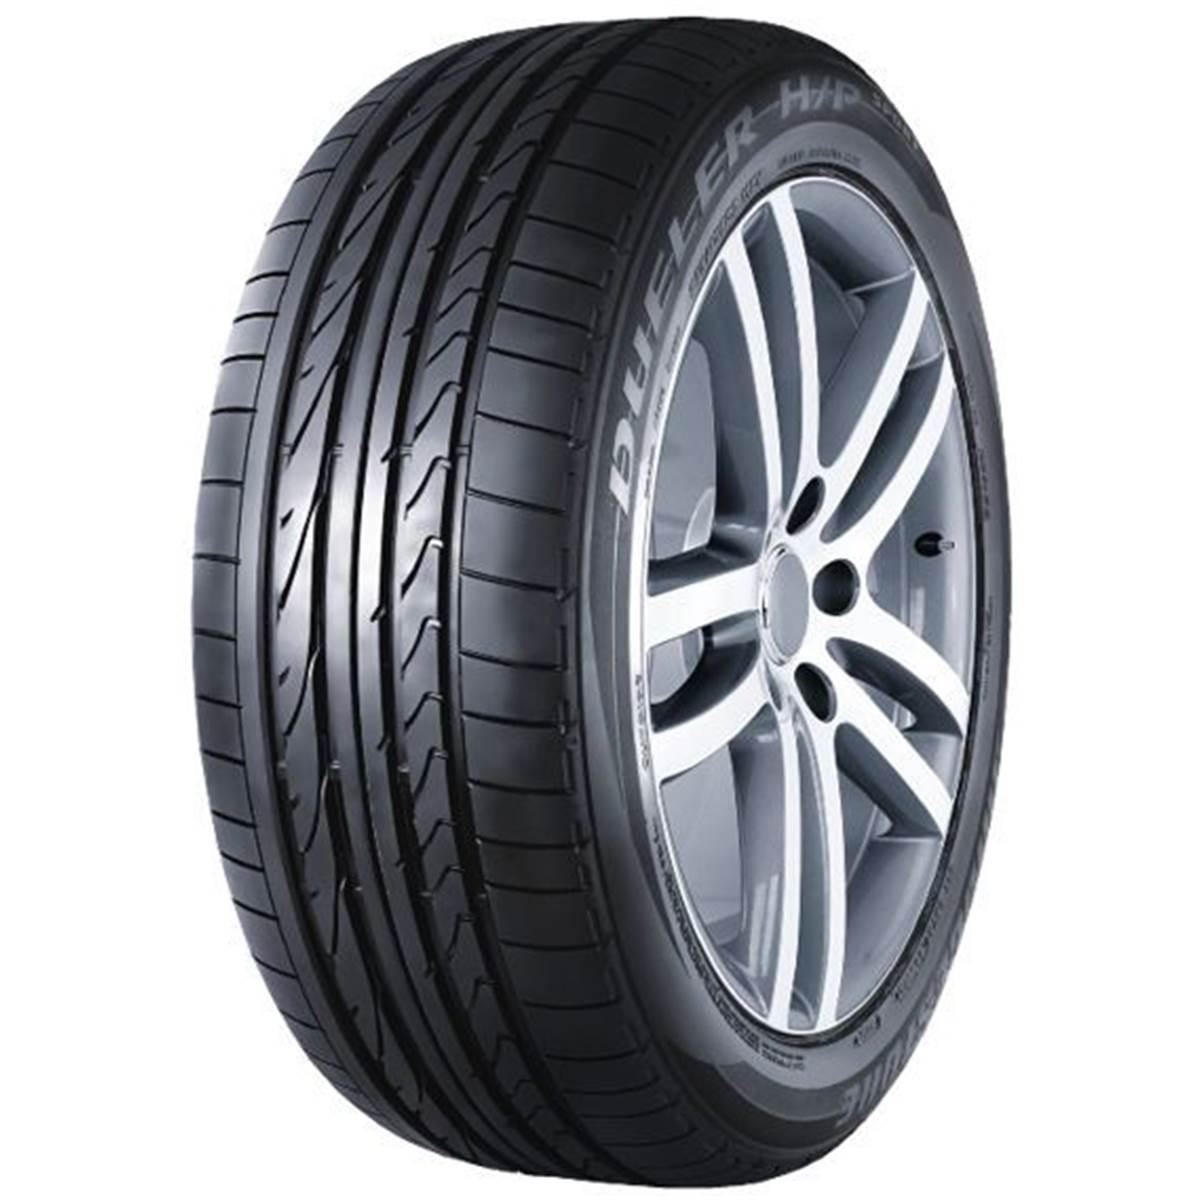 Bridgestone Bridgestone Dueler H/p Sport 255/55 R19 111 Y Xl